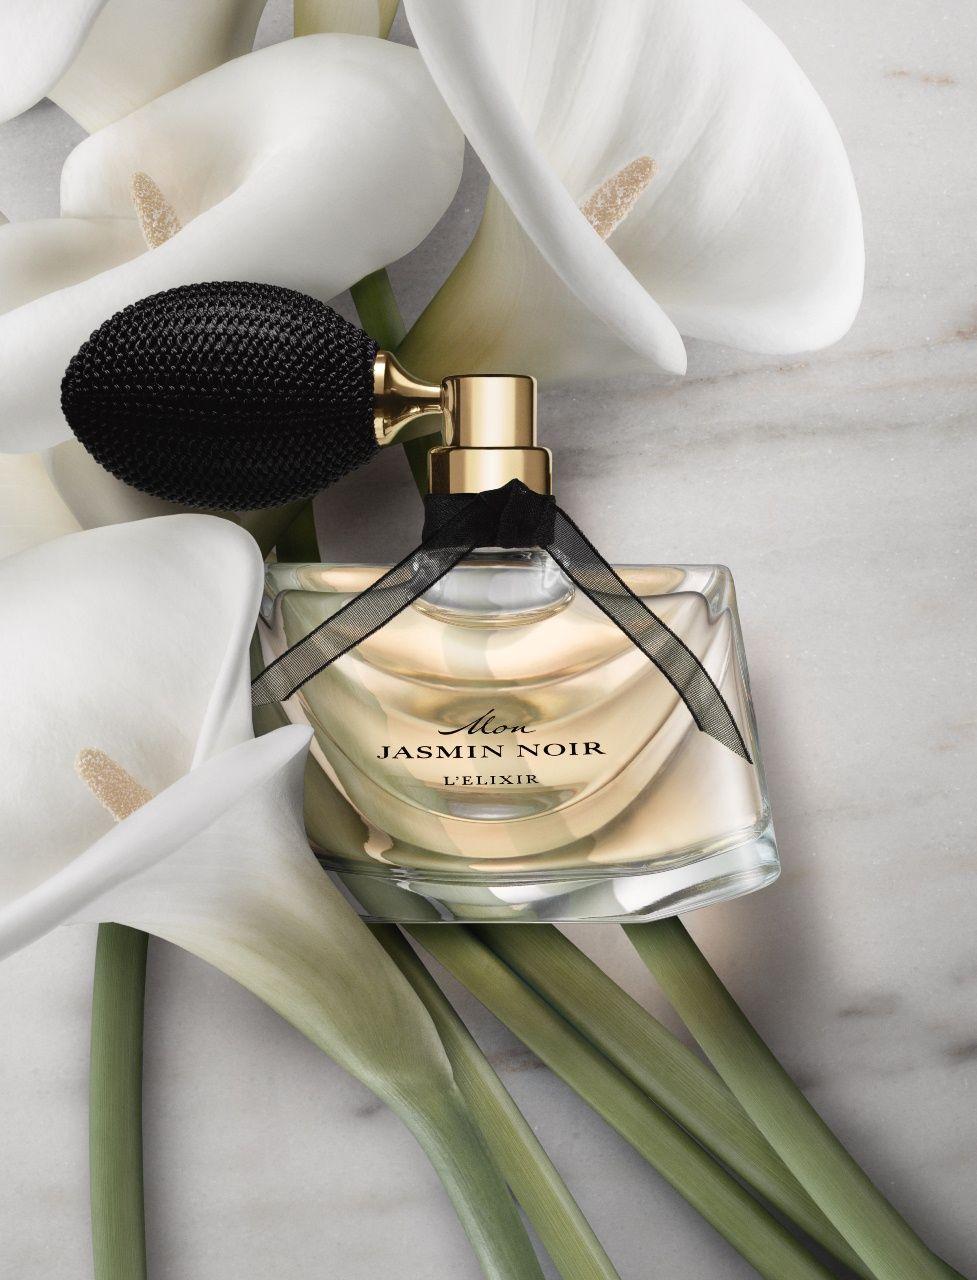 b122efc76 Bvlgari - Mon Jasmin Noir L'Elixir   Parfum.   Perfume, Perfume ...